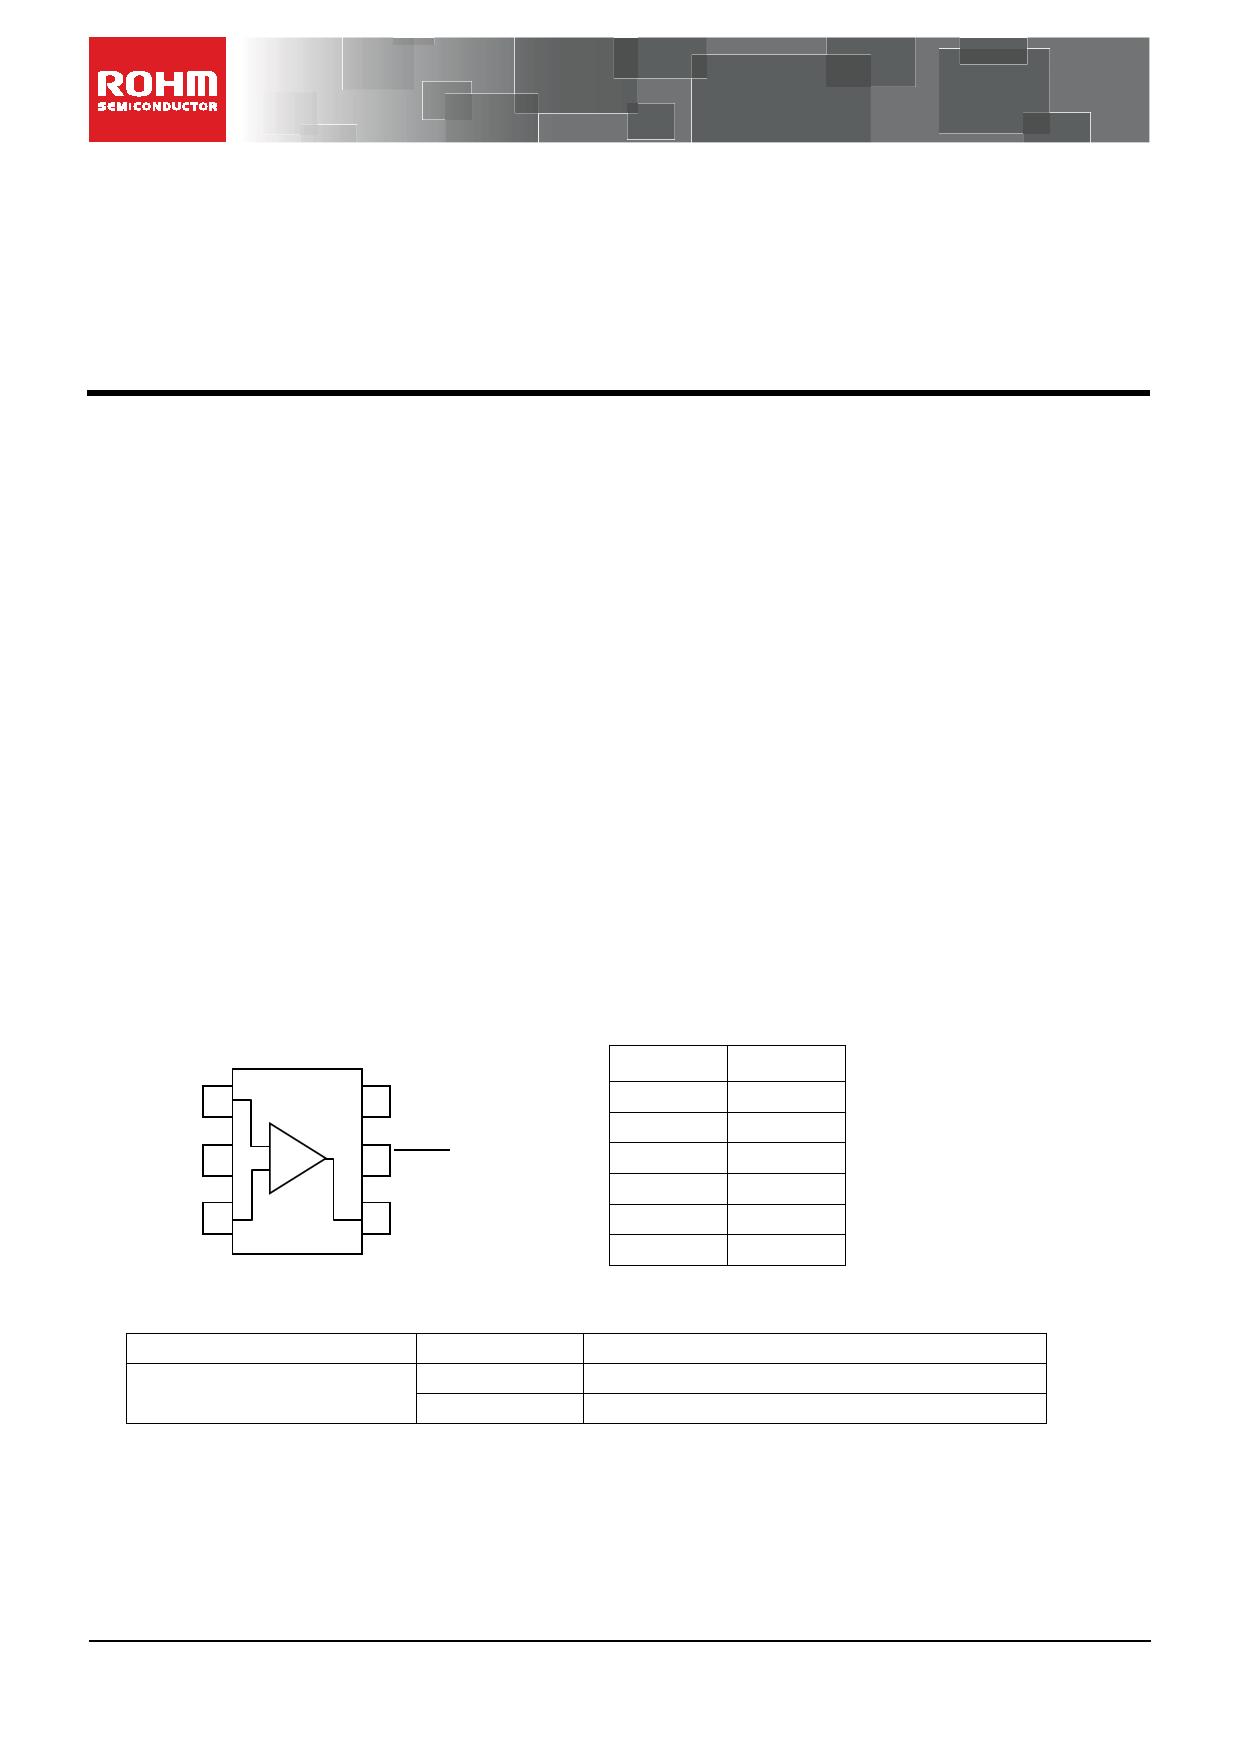 TLR342F datasheet